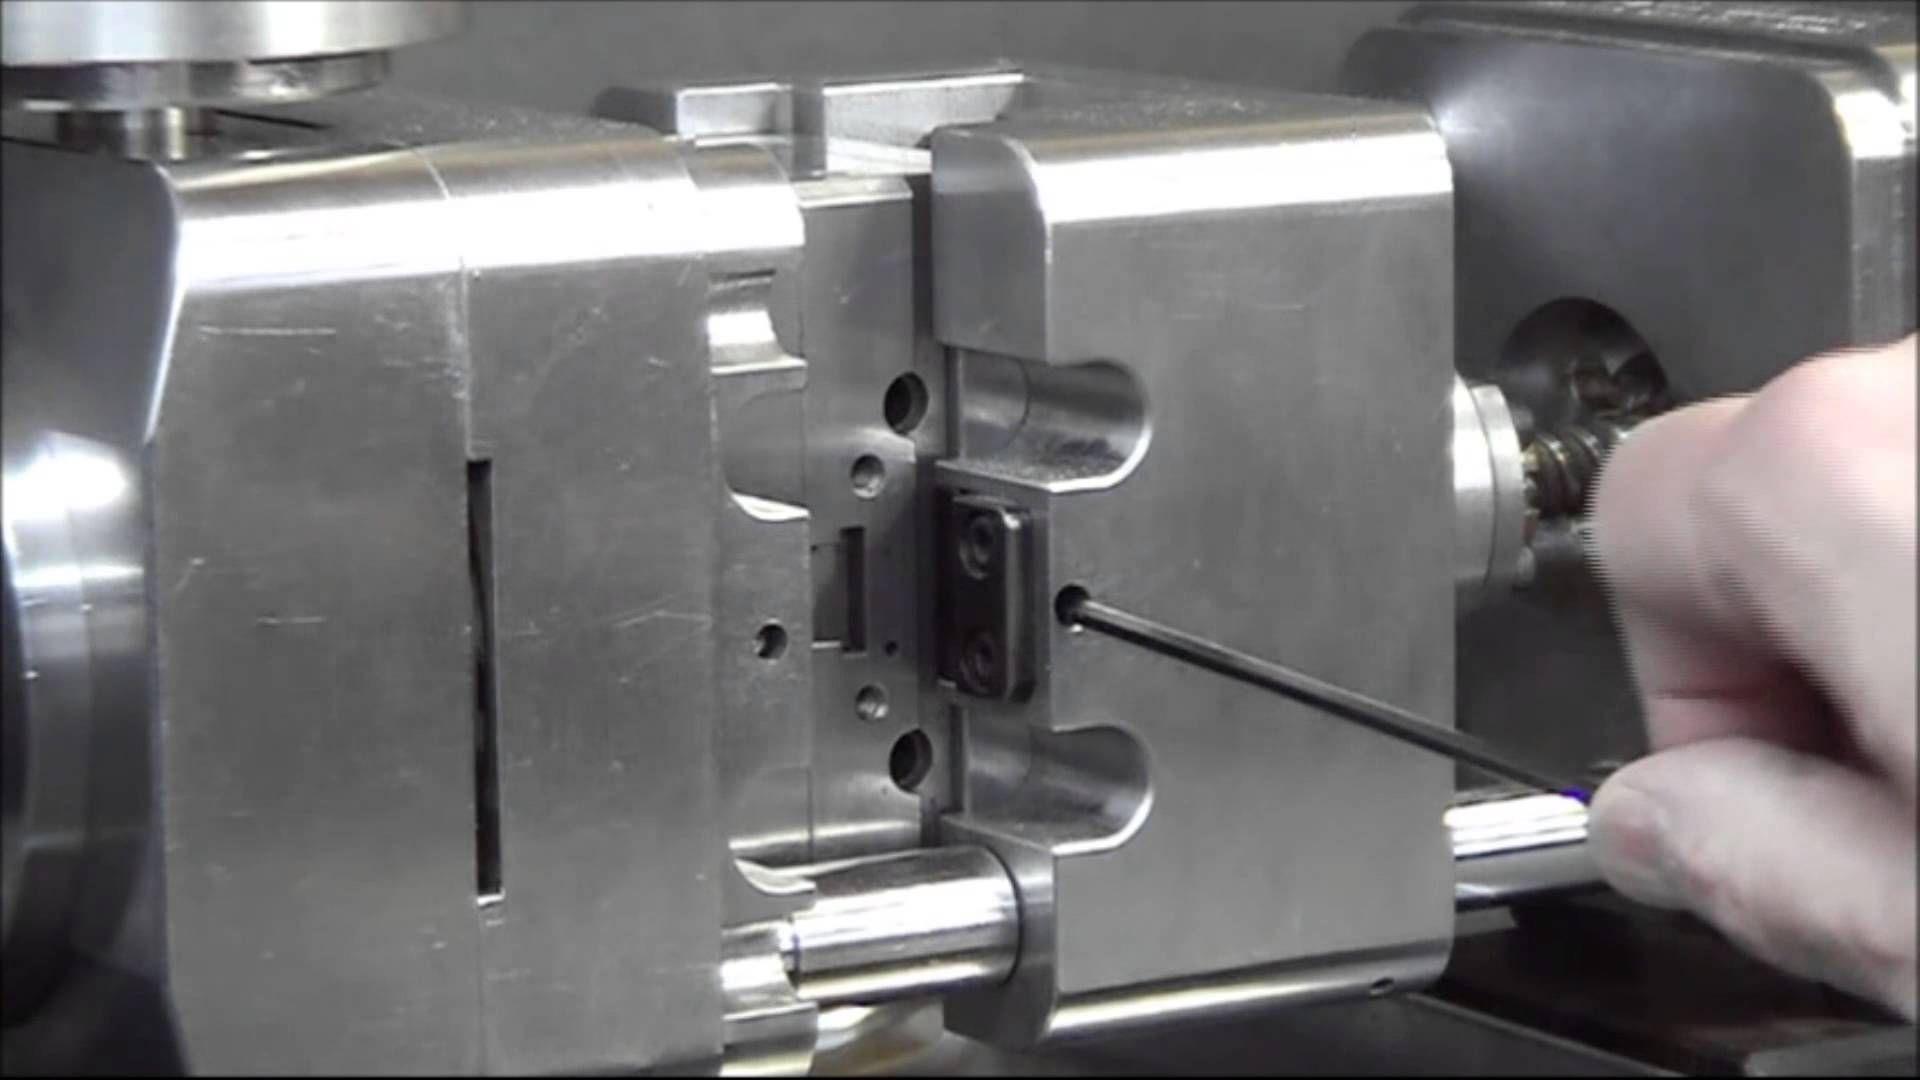 Cmobile micro injection molding machine idee progetti